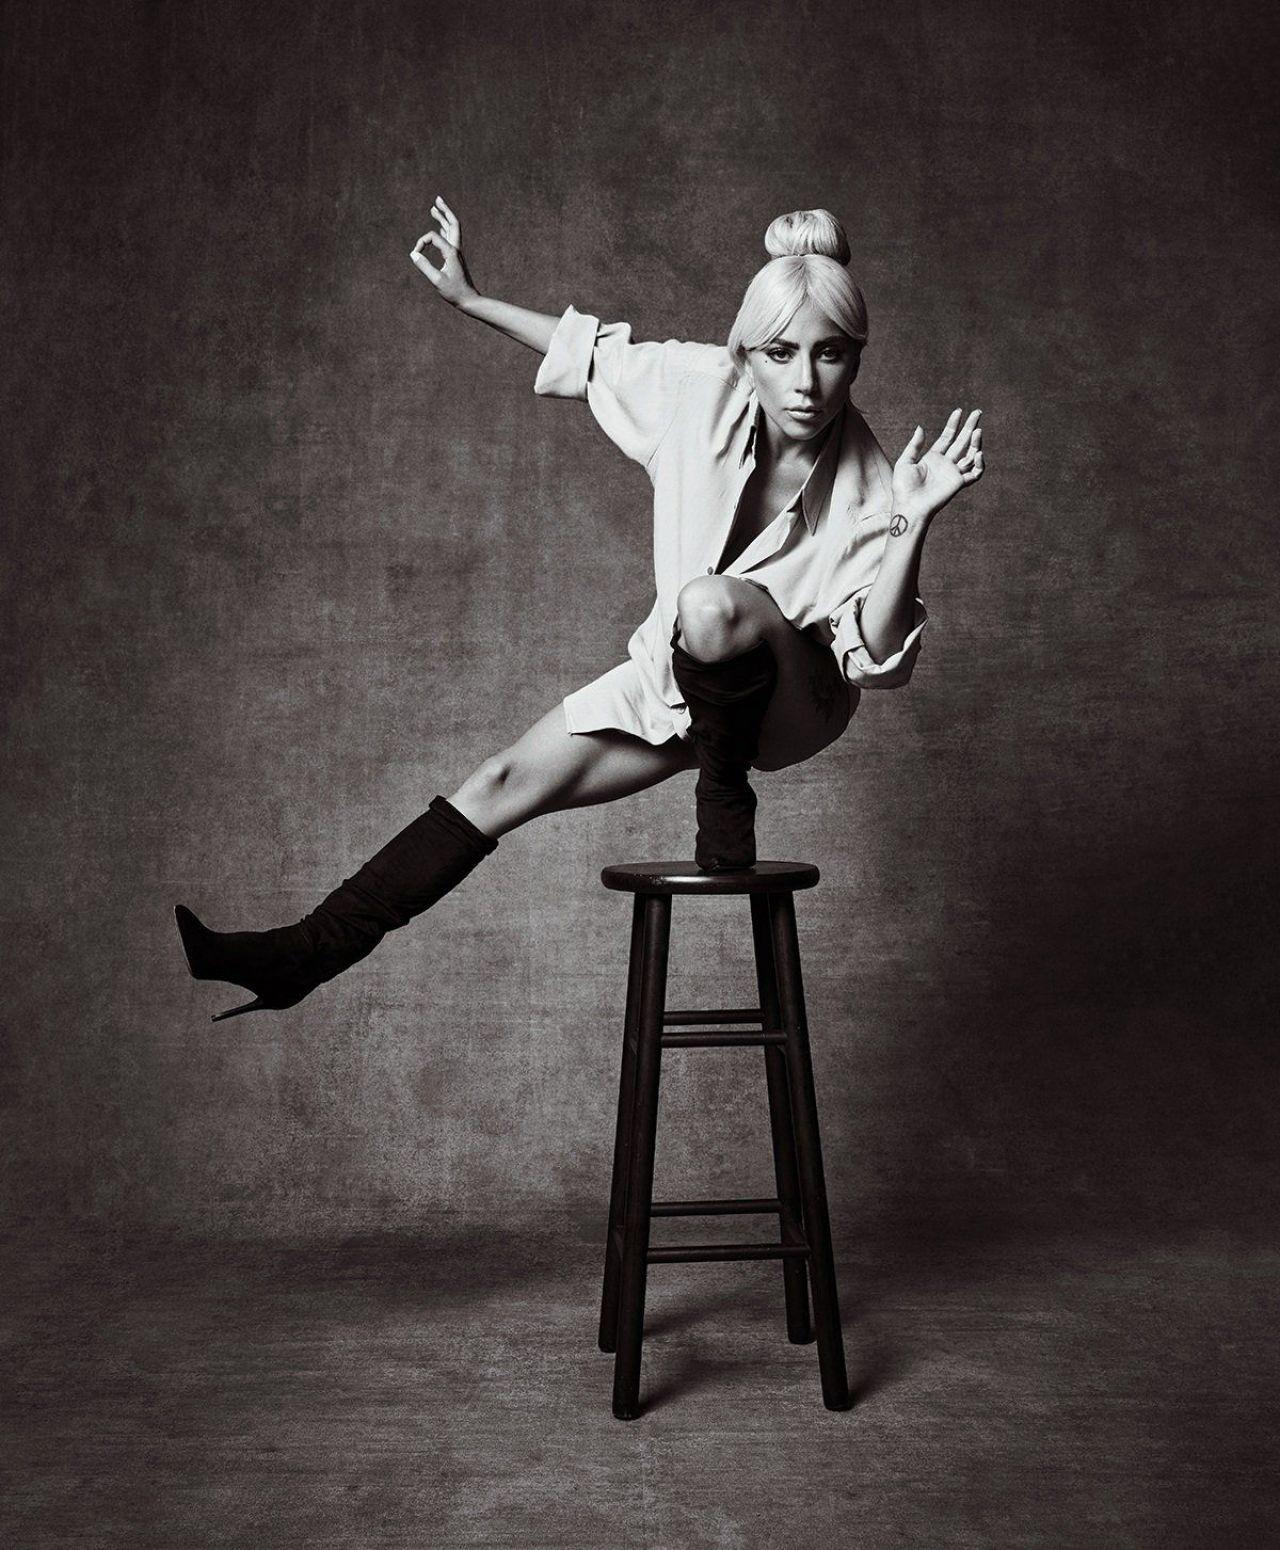 https://celebmafia.com/wp-content/uploads/2018/11/lady-gaga-variety-magazine-november-2018-3.jpg